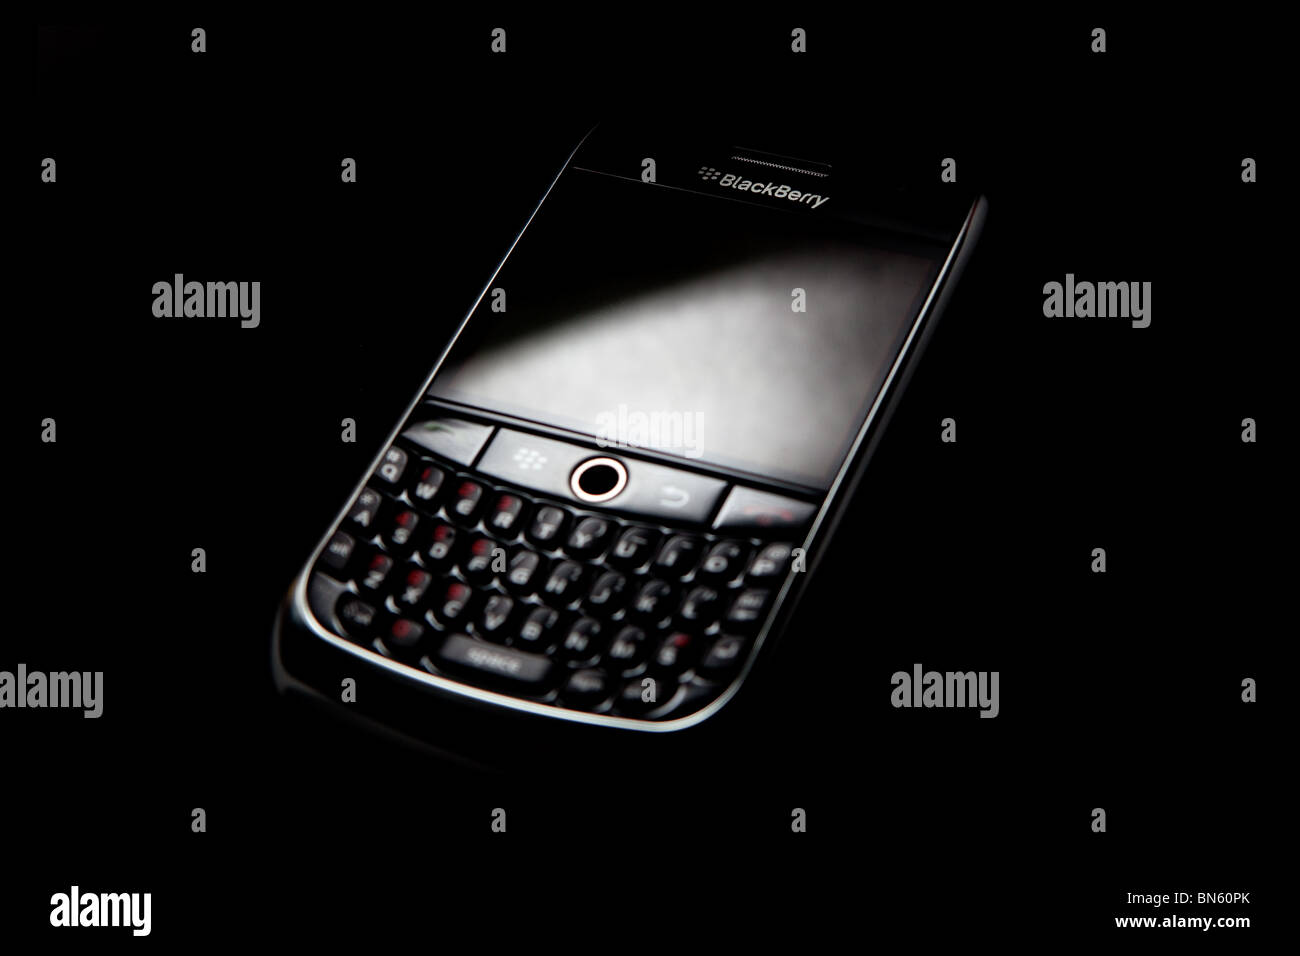 Blackberry 8900 on black background - Stock Image